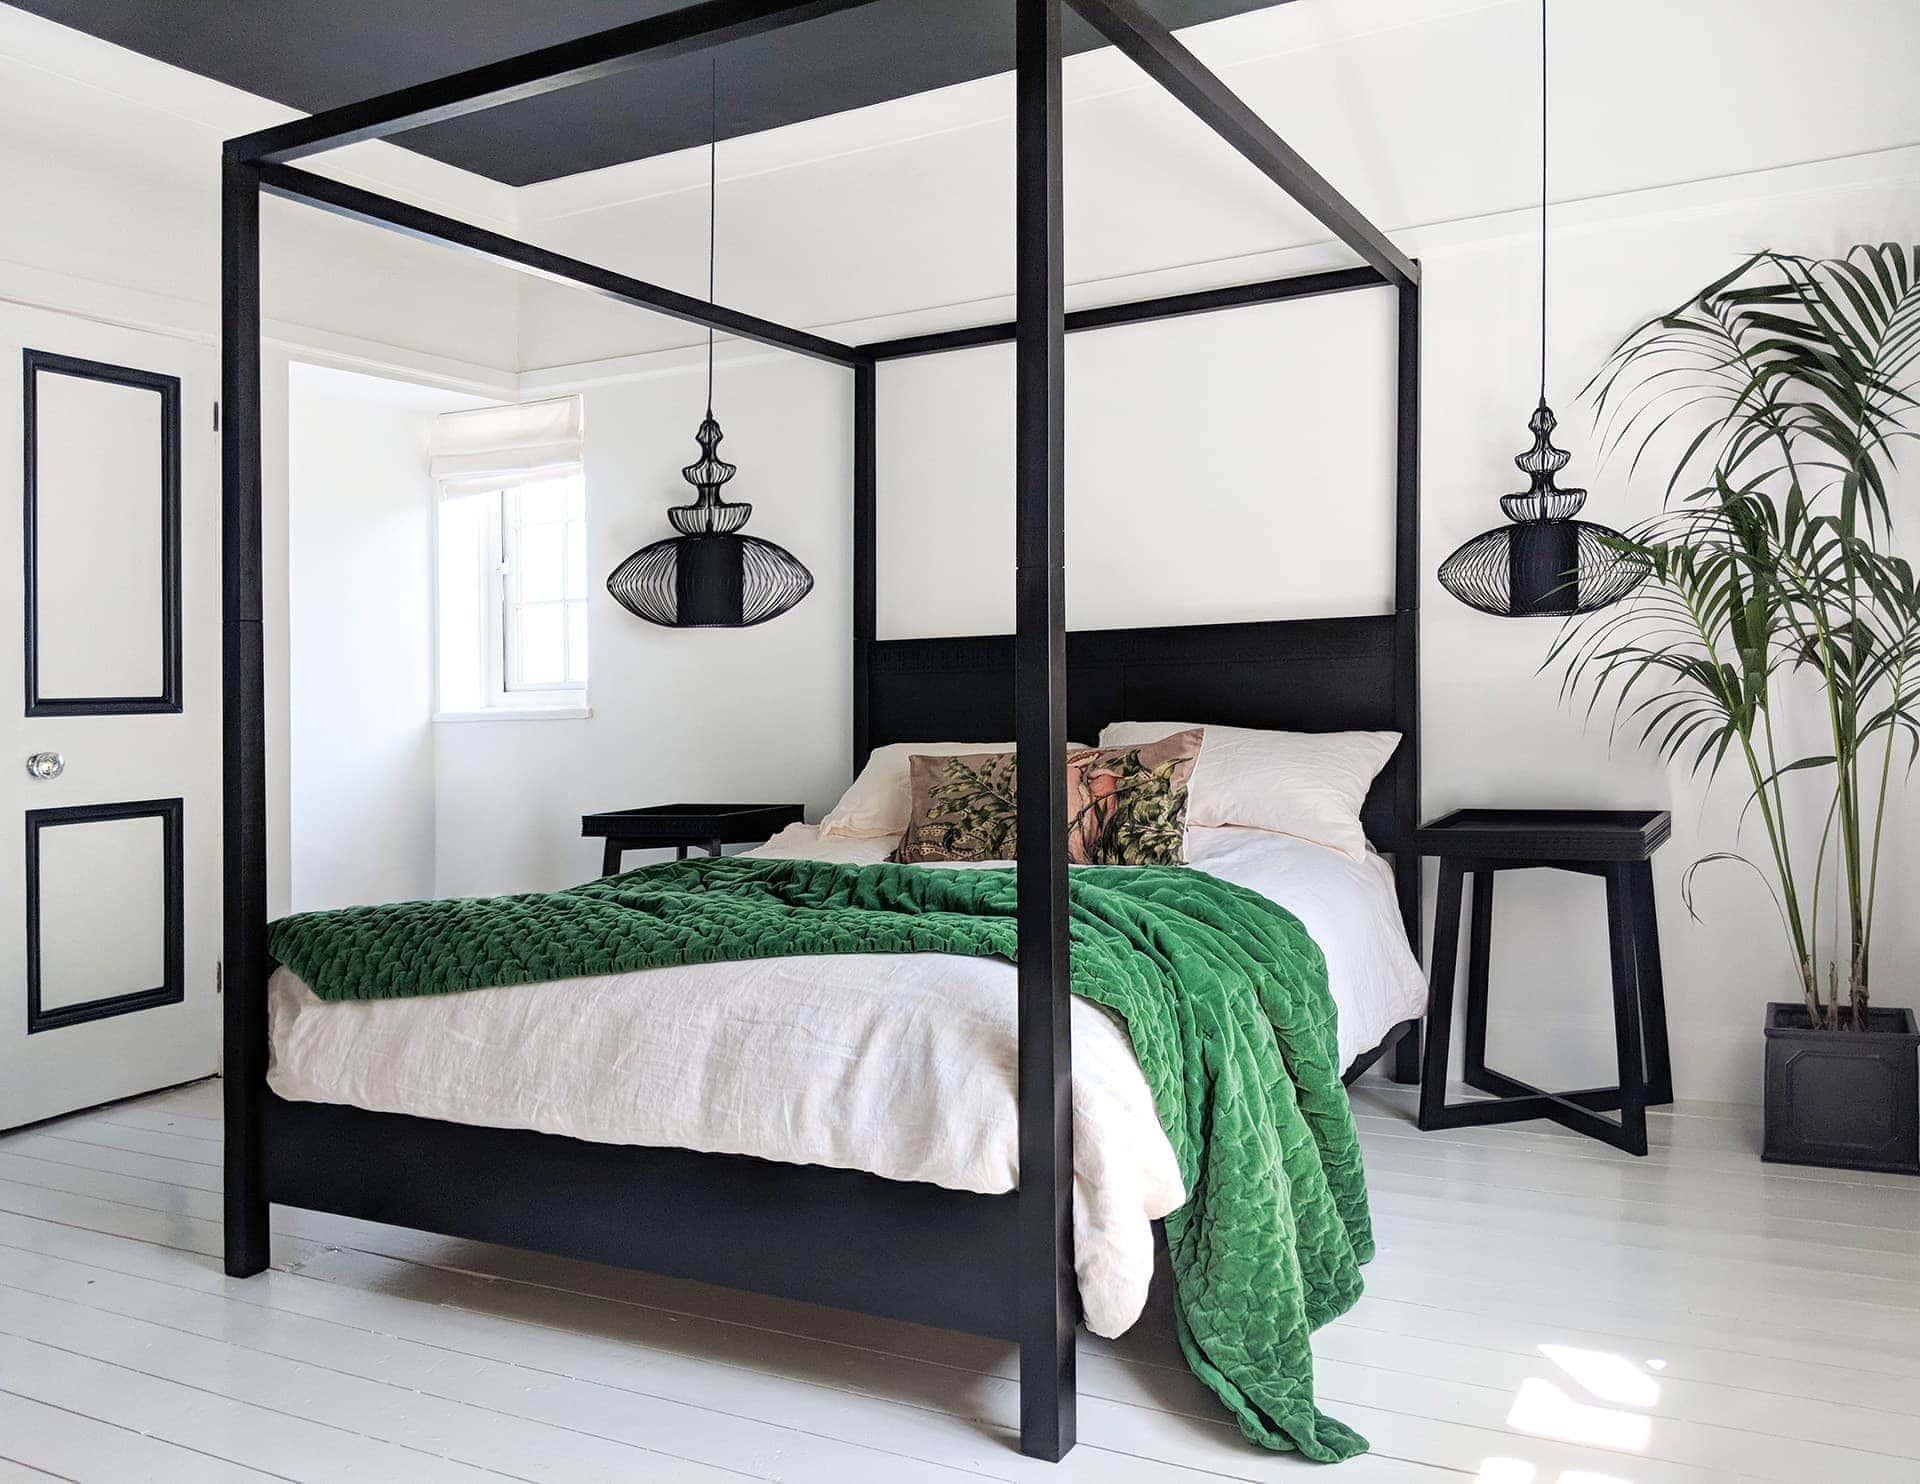 Choosing Pendant Lights for a Master Bedroom - TLC Interiors